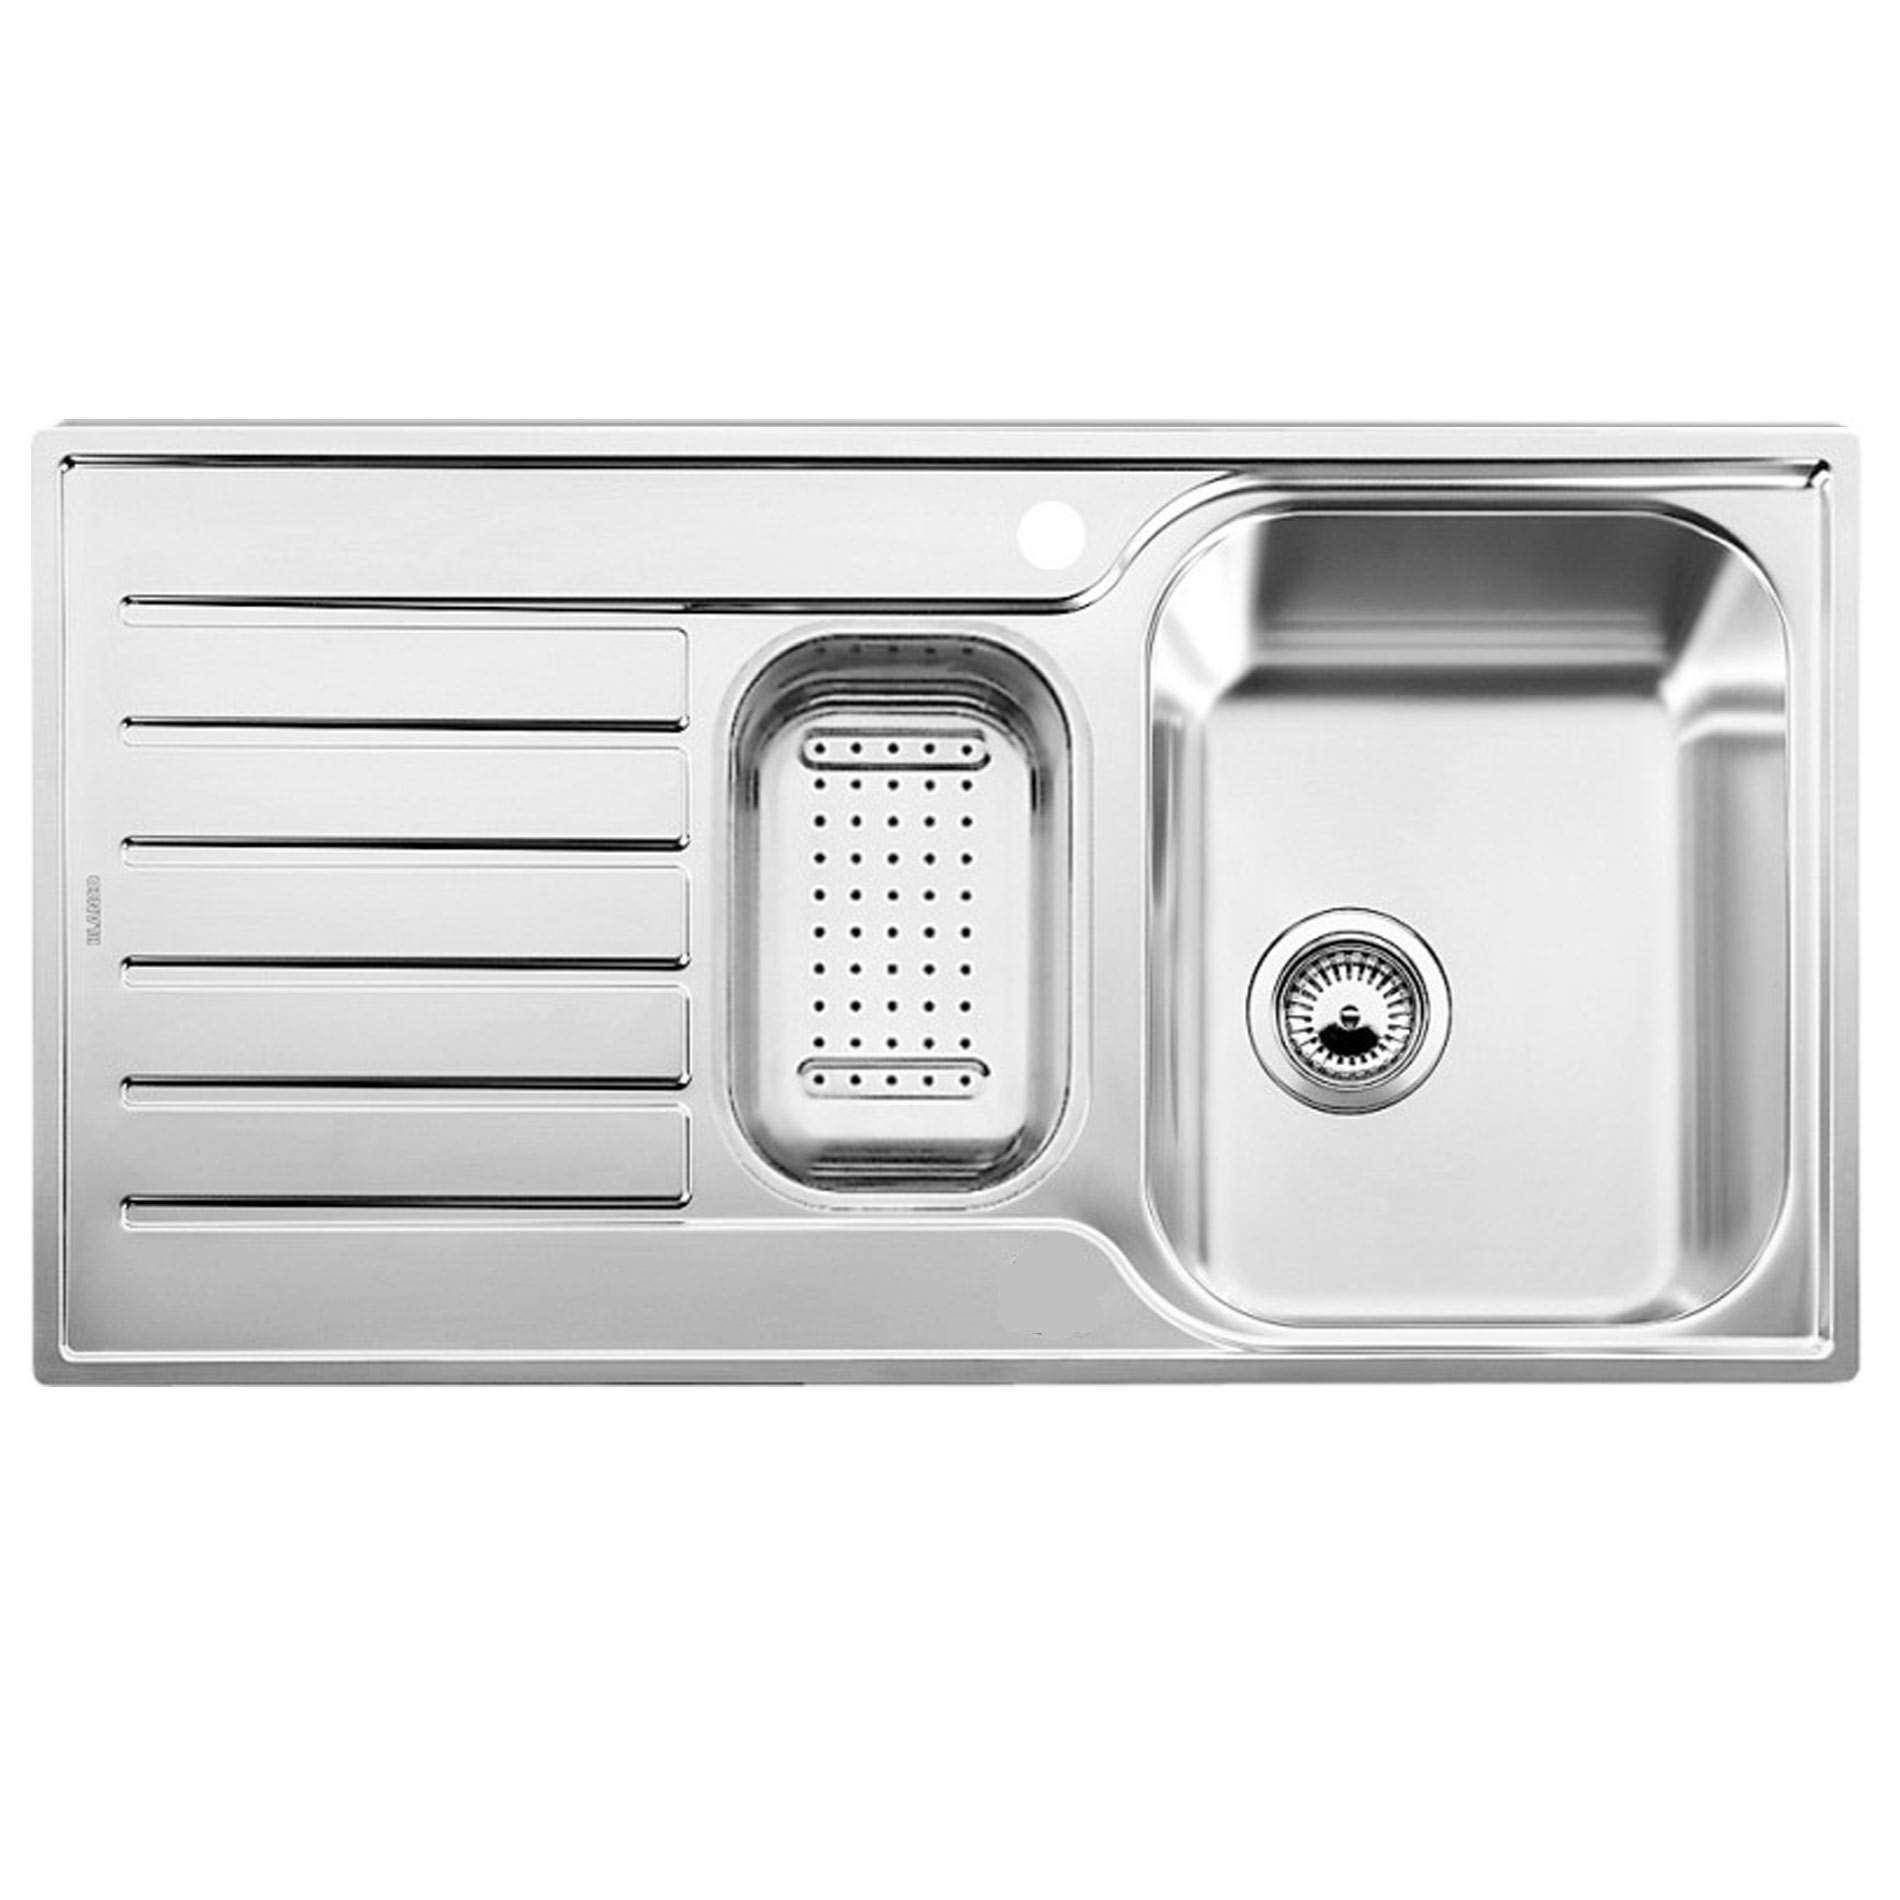 Kitchen Sinks & Taps - Blanco: Lantos 6 S-IF Stainless Steel Sink